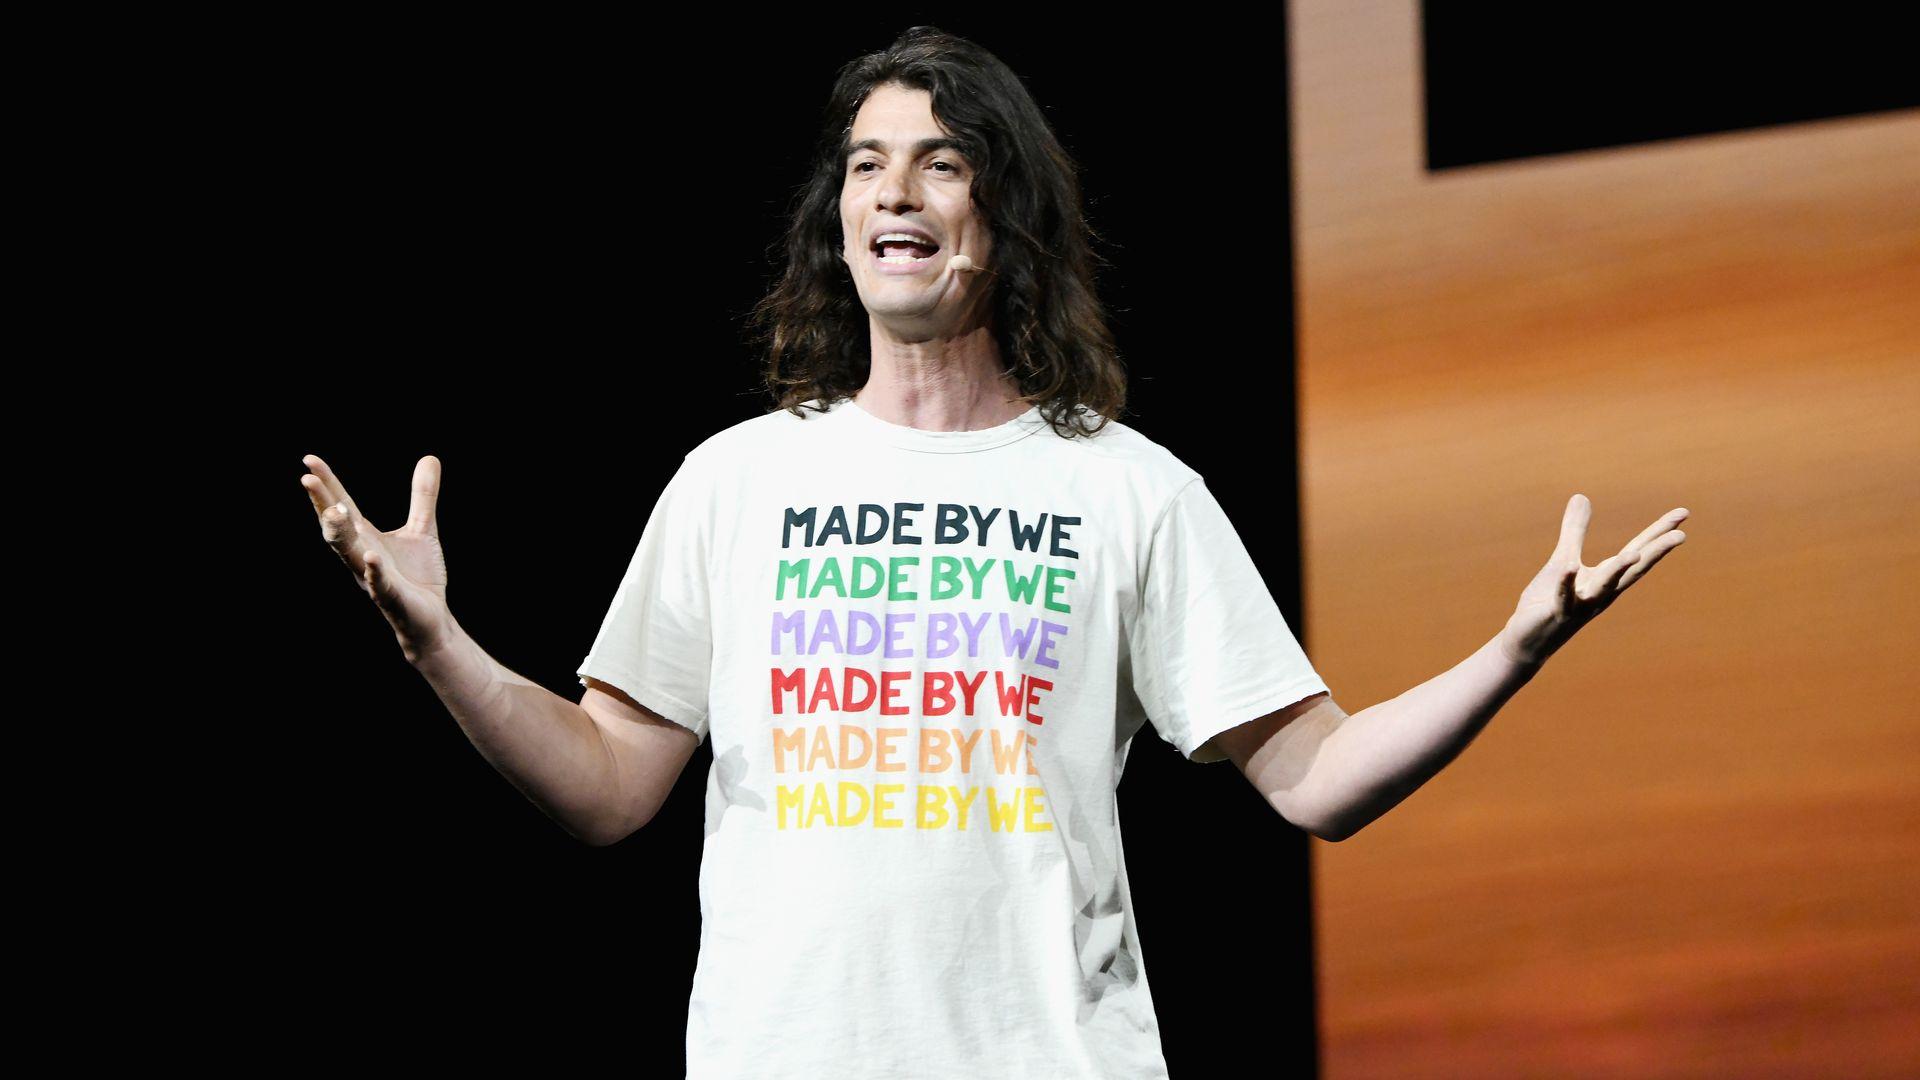 WeWork founder and CEO Adam Neumann